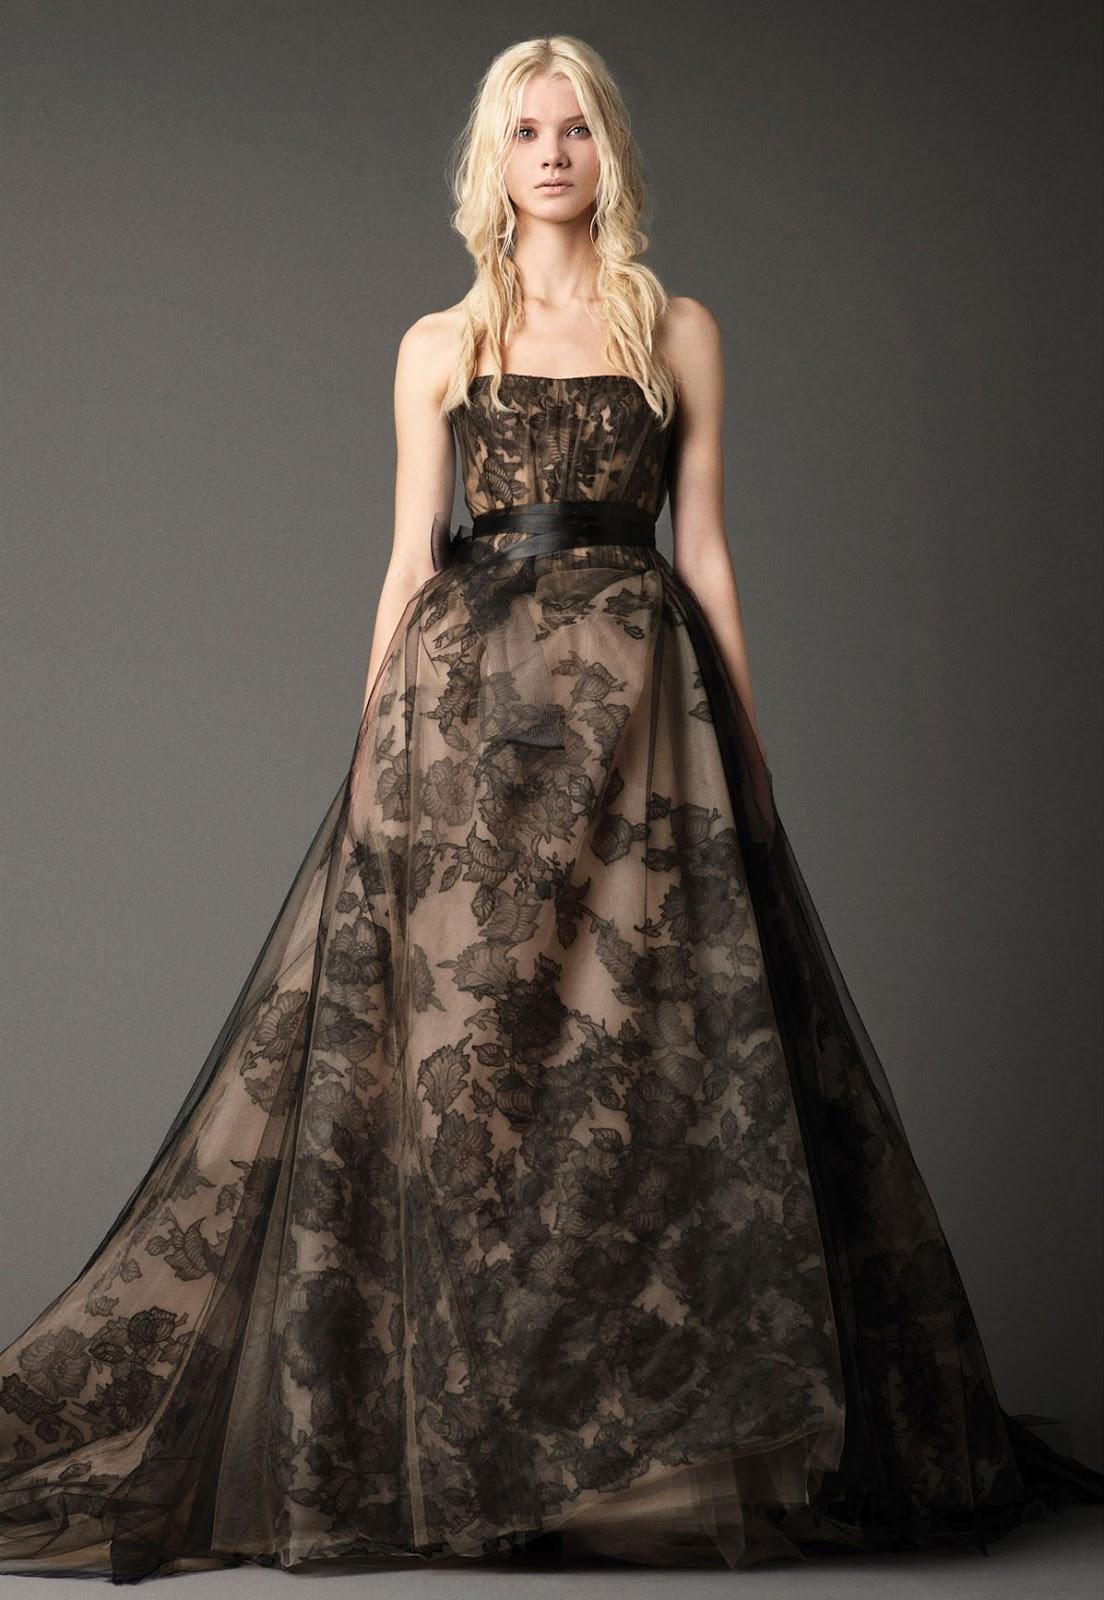 CJNT Wedding Inspirations Vera Wang Fall 2012 Bridal Gown Collection Black Colour